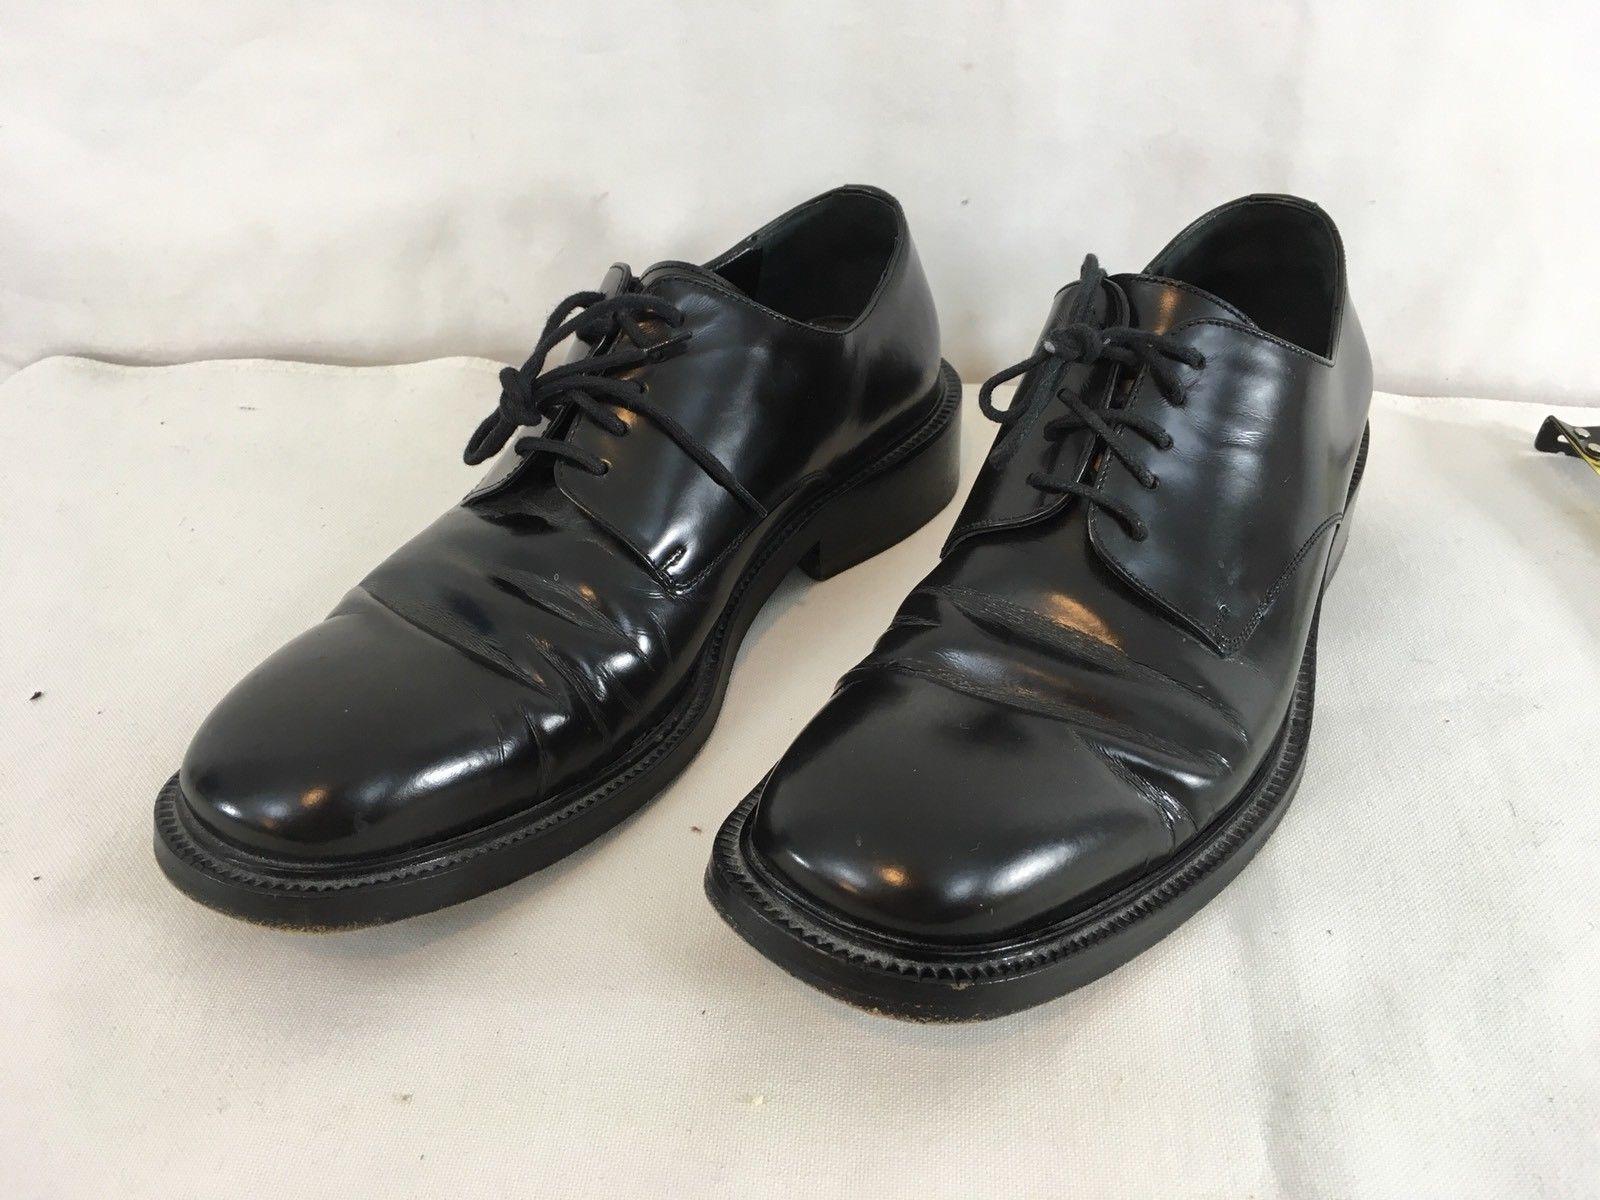 dedf93b2e Gucci Mens 6 1/2 D Black Leather Italian and 50 similar items